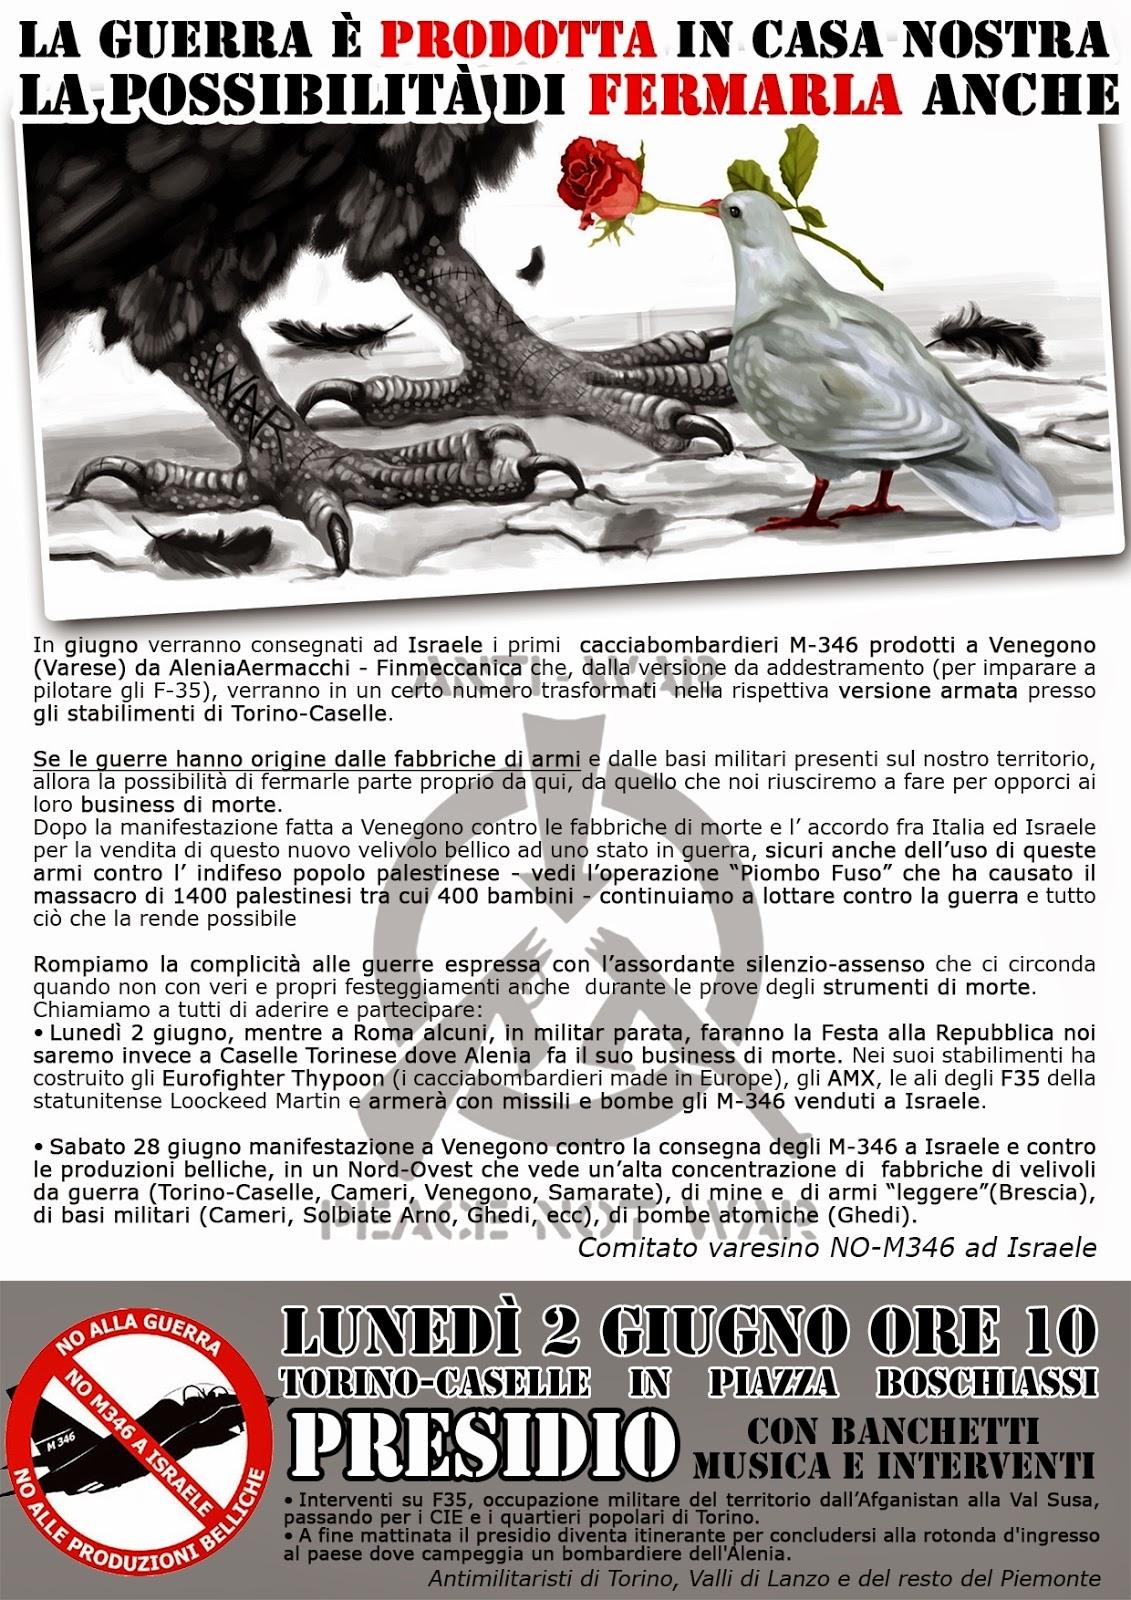 063 nikitatunde guerra en la exyugoslavia sc7 - 2 2